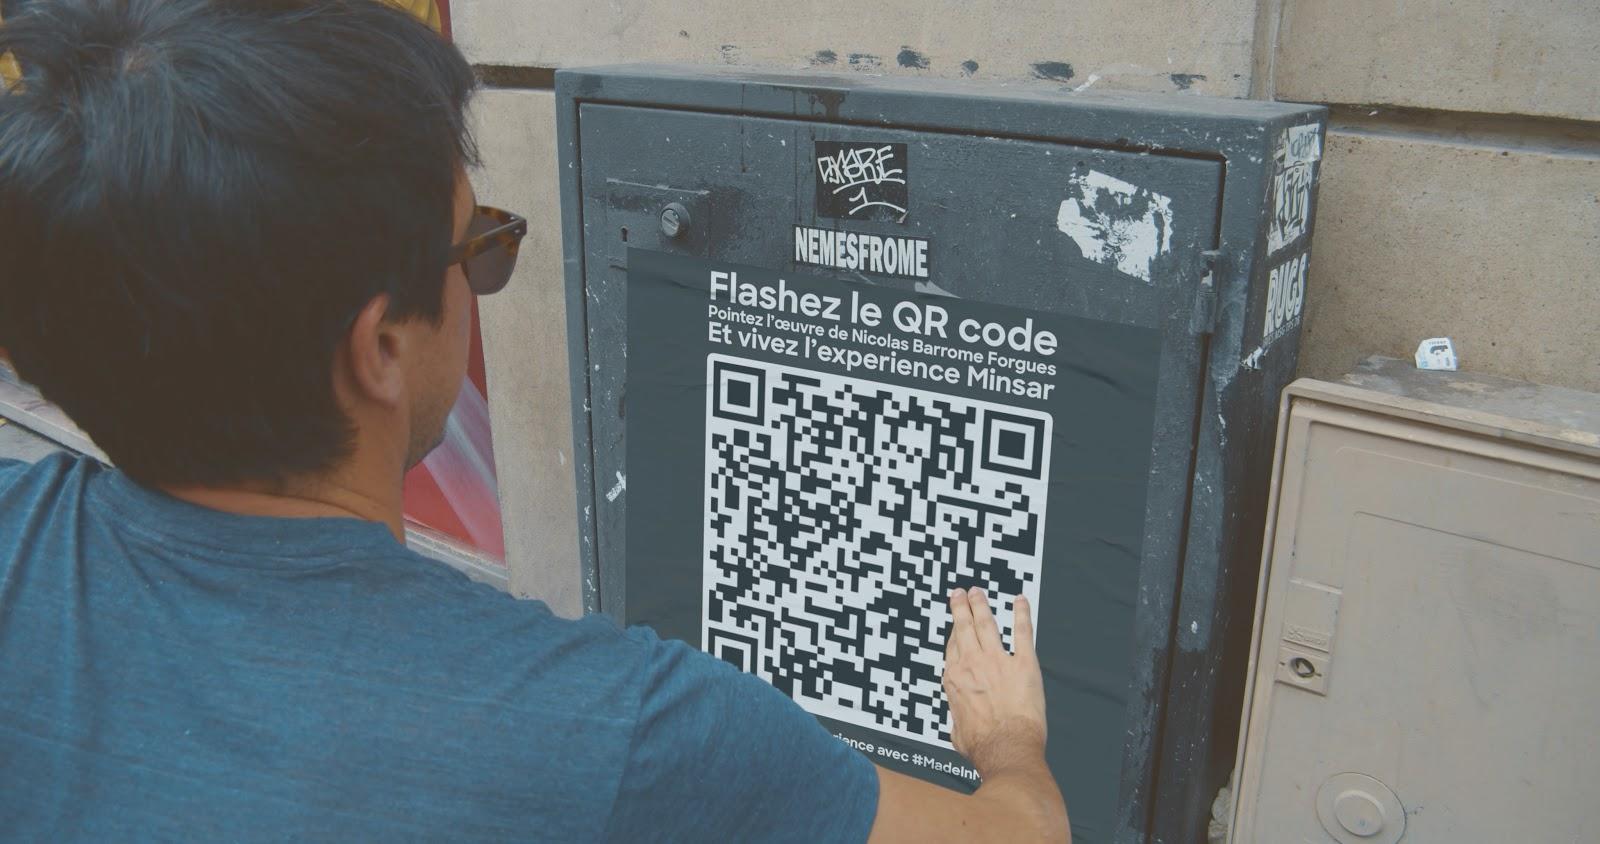 nicolas barrome street art augmented reality